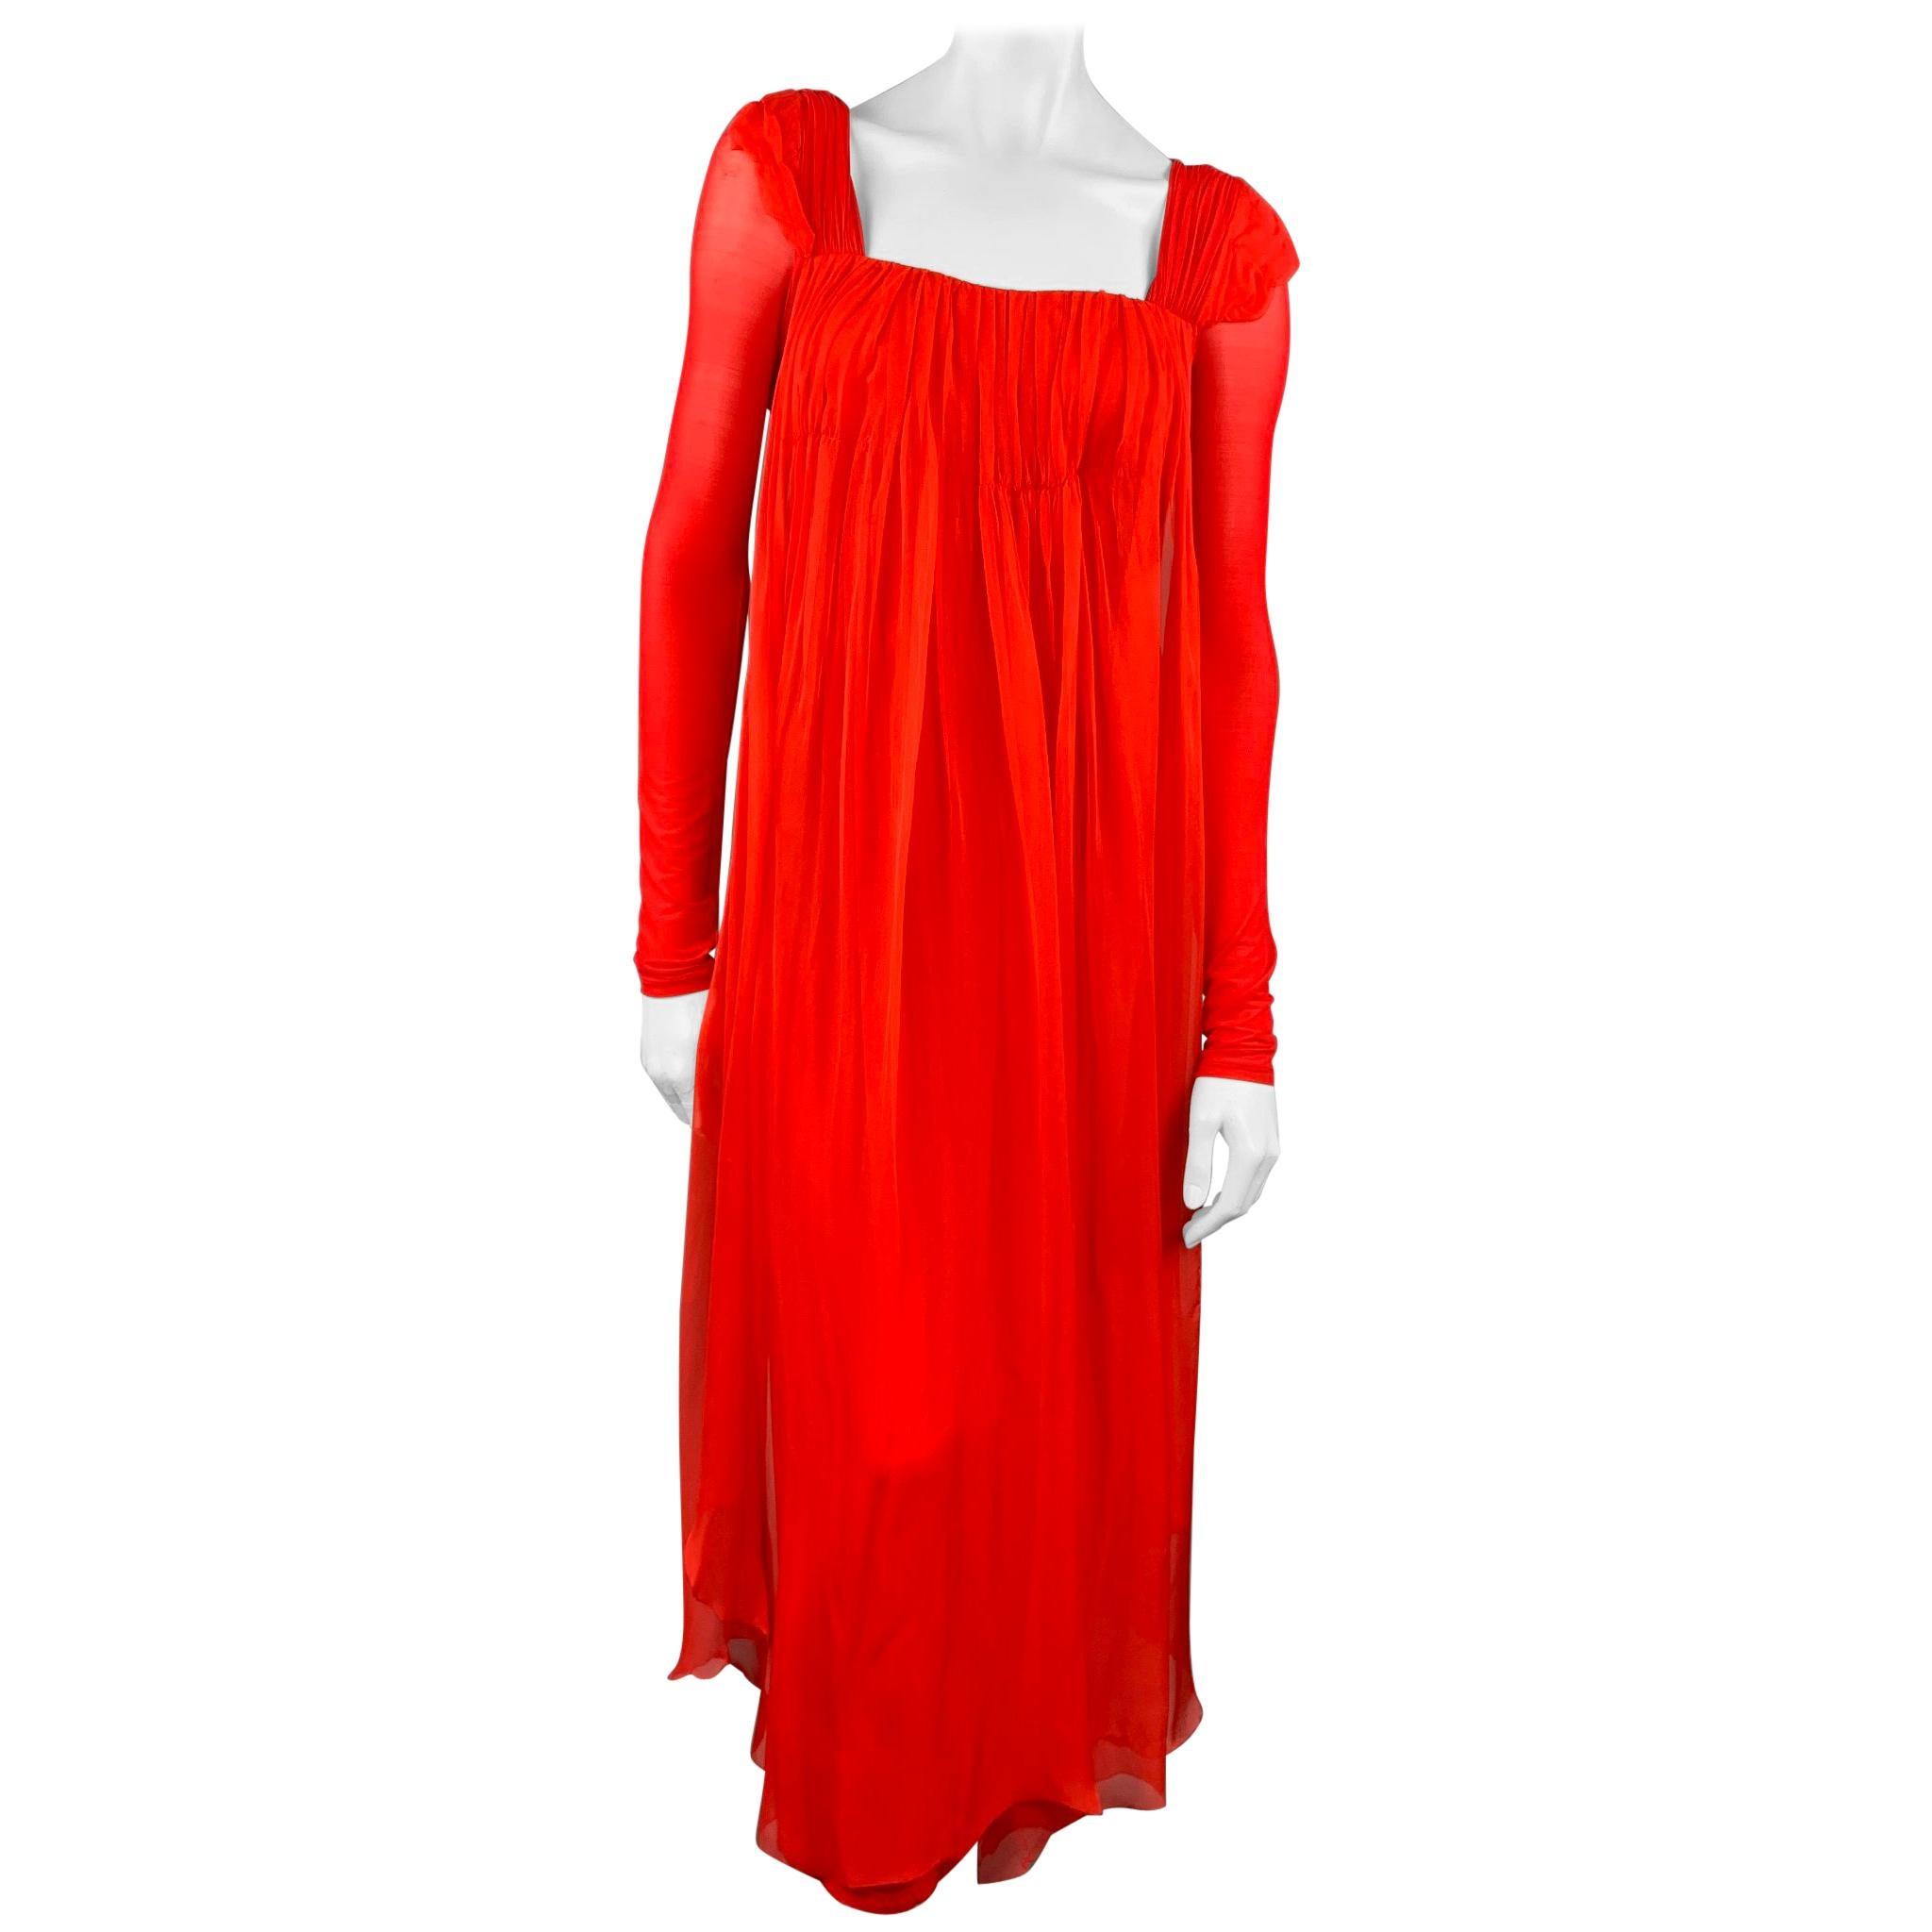 DONNA KARAN Size XS Red Cupro Blend Draped Evening Gown